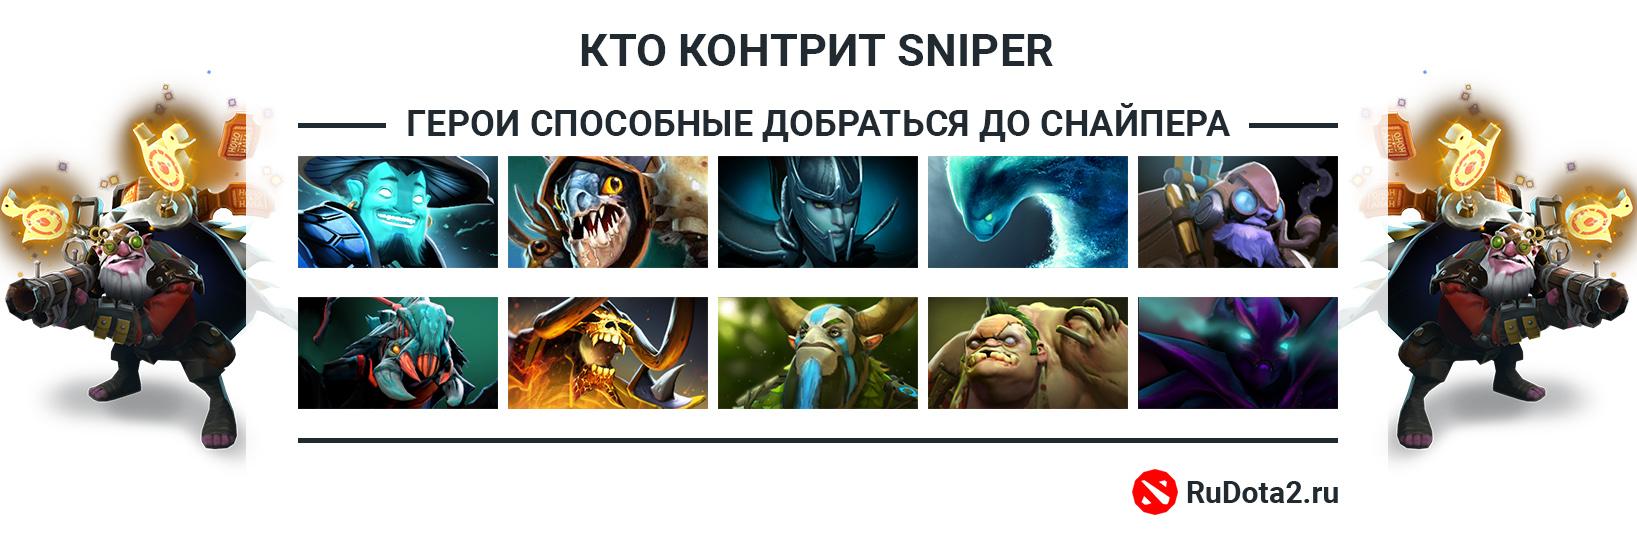 Кто контрит Снайпера